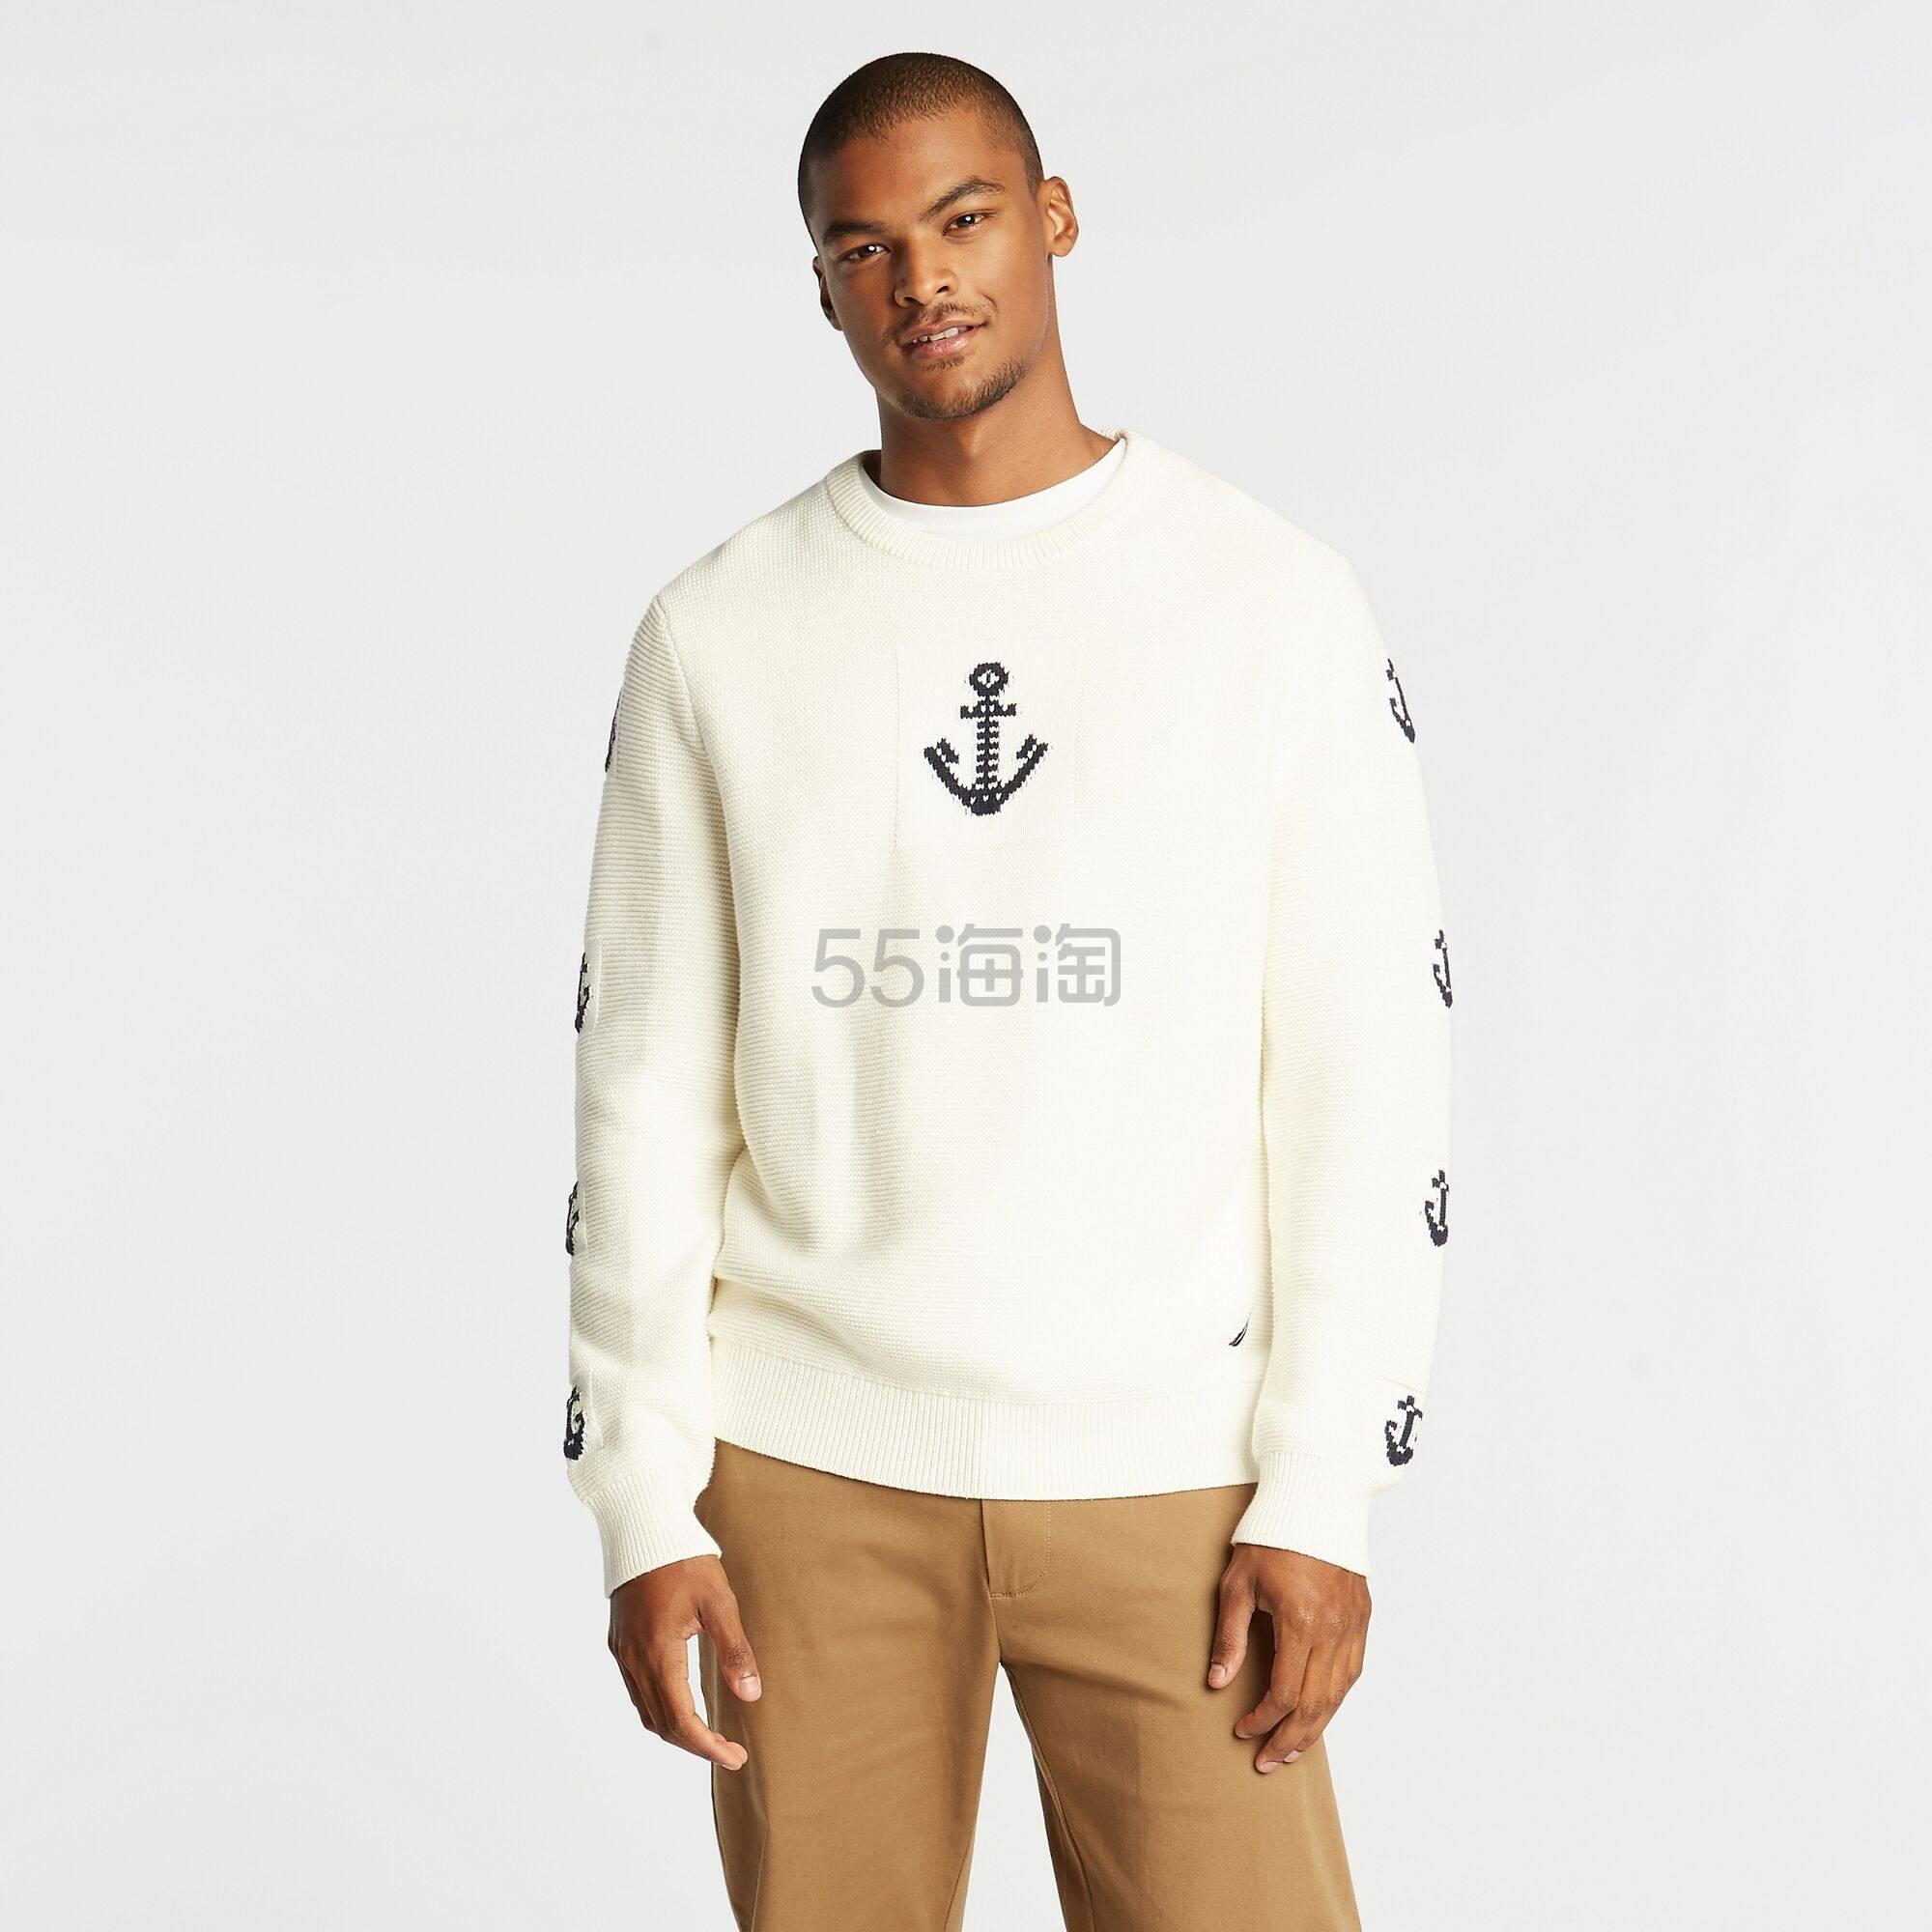 Nautica 基础 Logo 男士针织衫毛衣 .2(约273元) - 海淘优惠海淘折扣|55海淘网